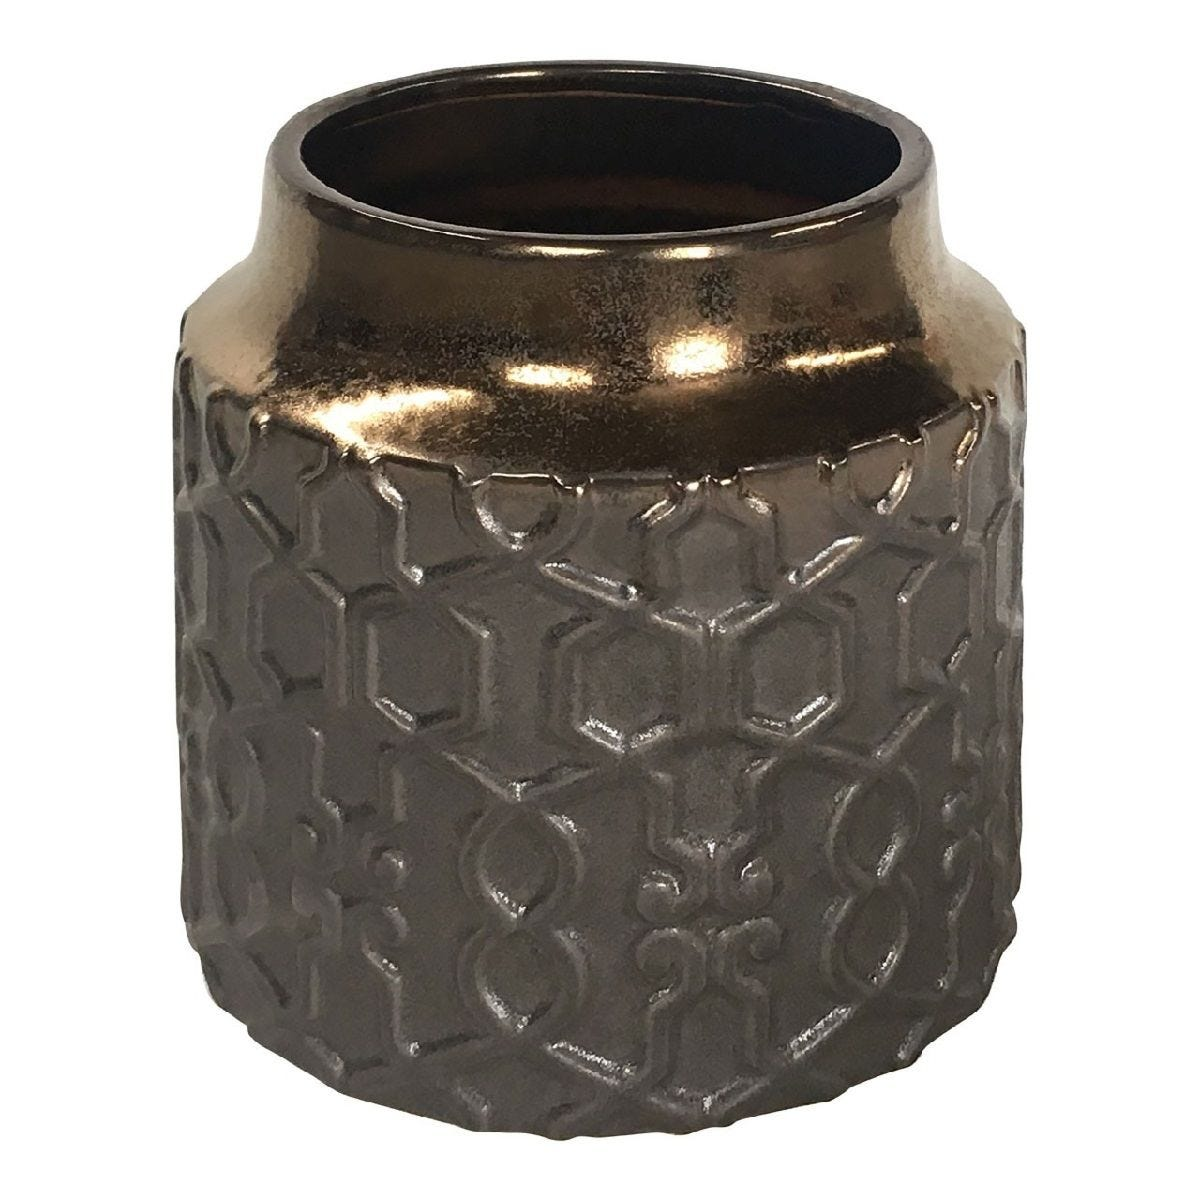 Premier Housewares Zircon Ceramic Planter Metallic - Large